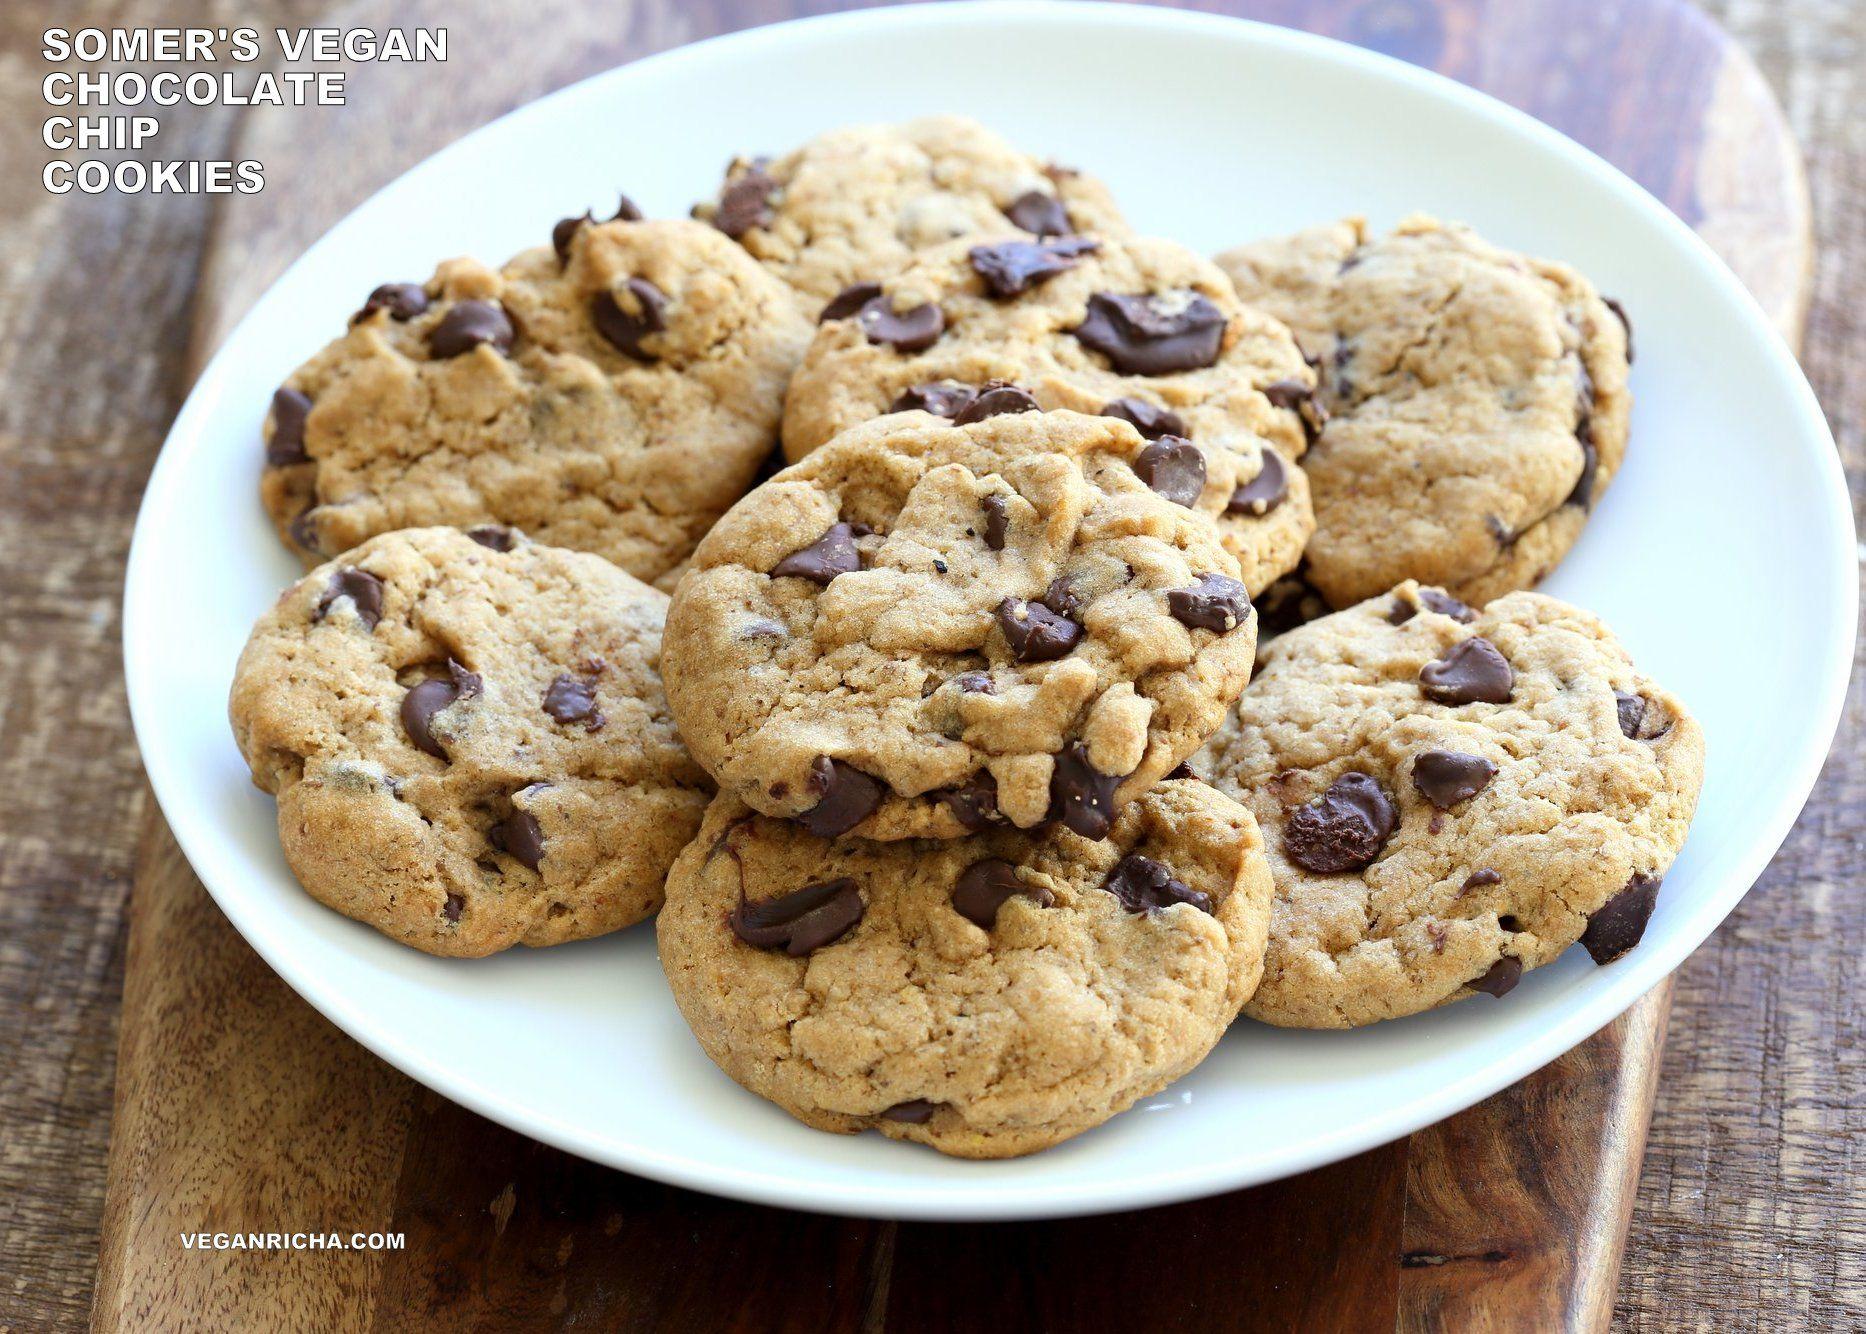 Vegan Chocolate Chip Cookies With Coconut Oil Palm Oil Free Recipe Vegan Richa Recipe Keto Chocolate Chip Cookies Cookies Recipes Chocolate Chip Vegan Chocolate Chip Cookies